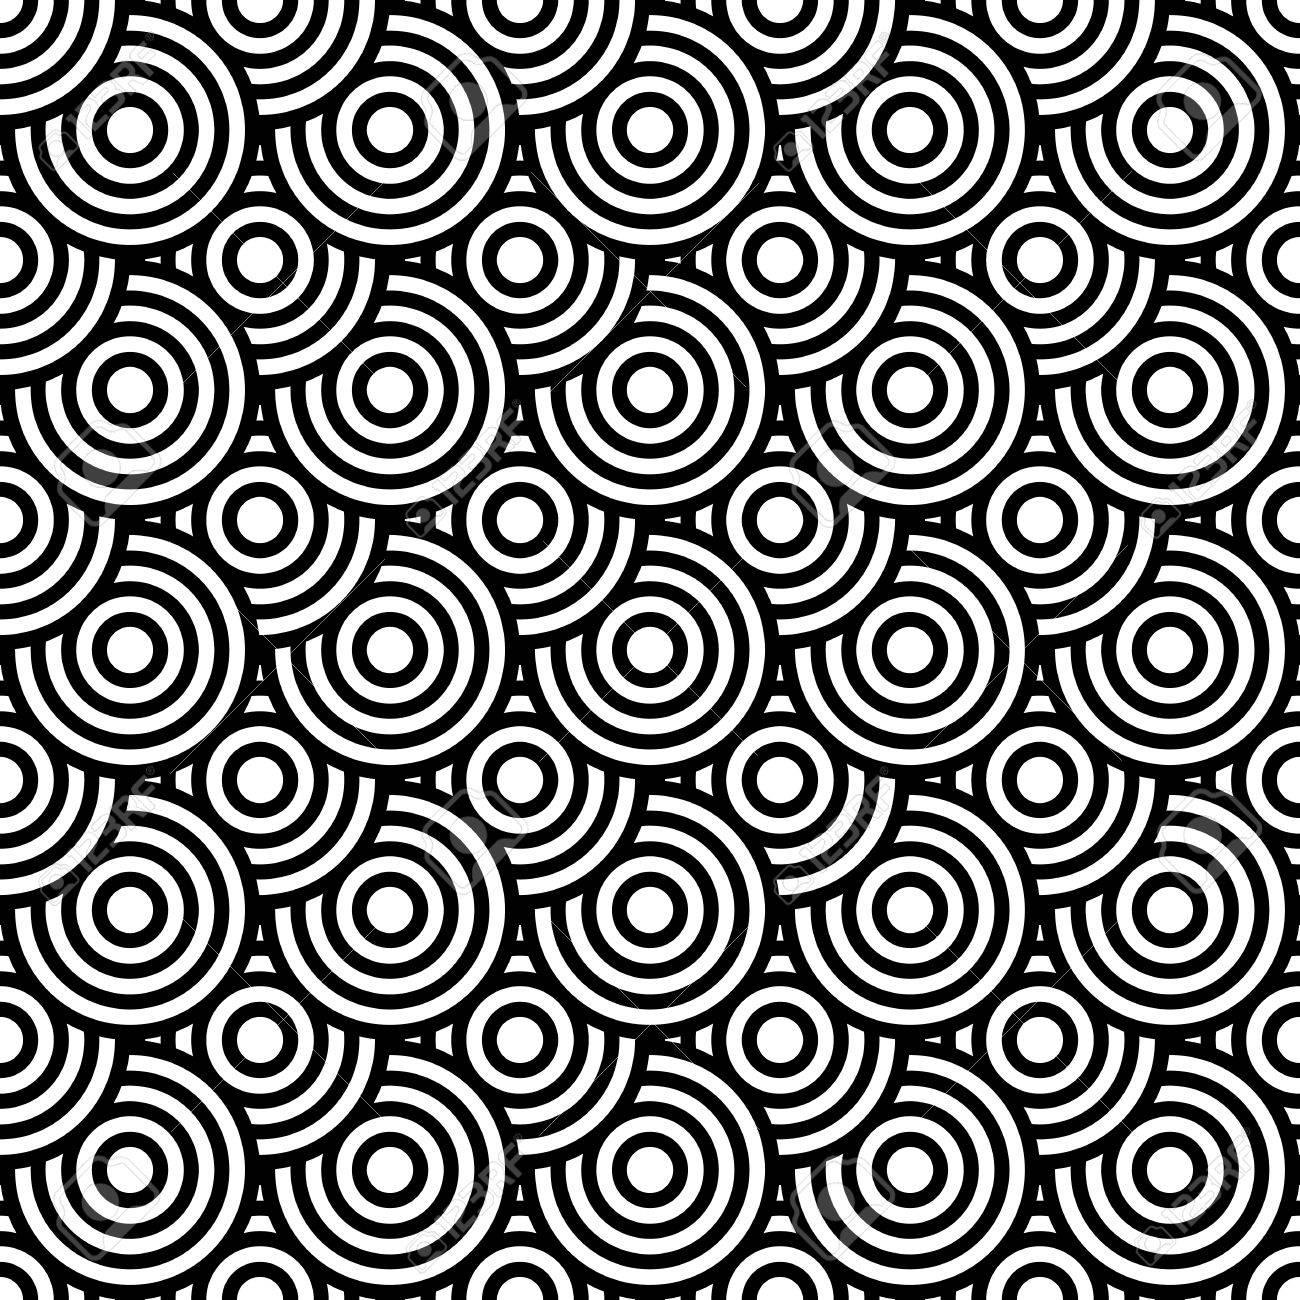 Seamless op art texture with circle elements. Vector art. Stock Vector - 24928811